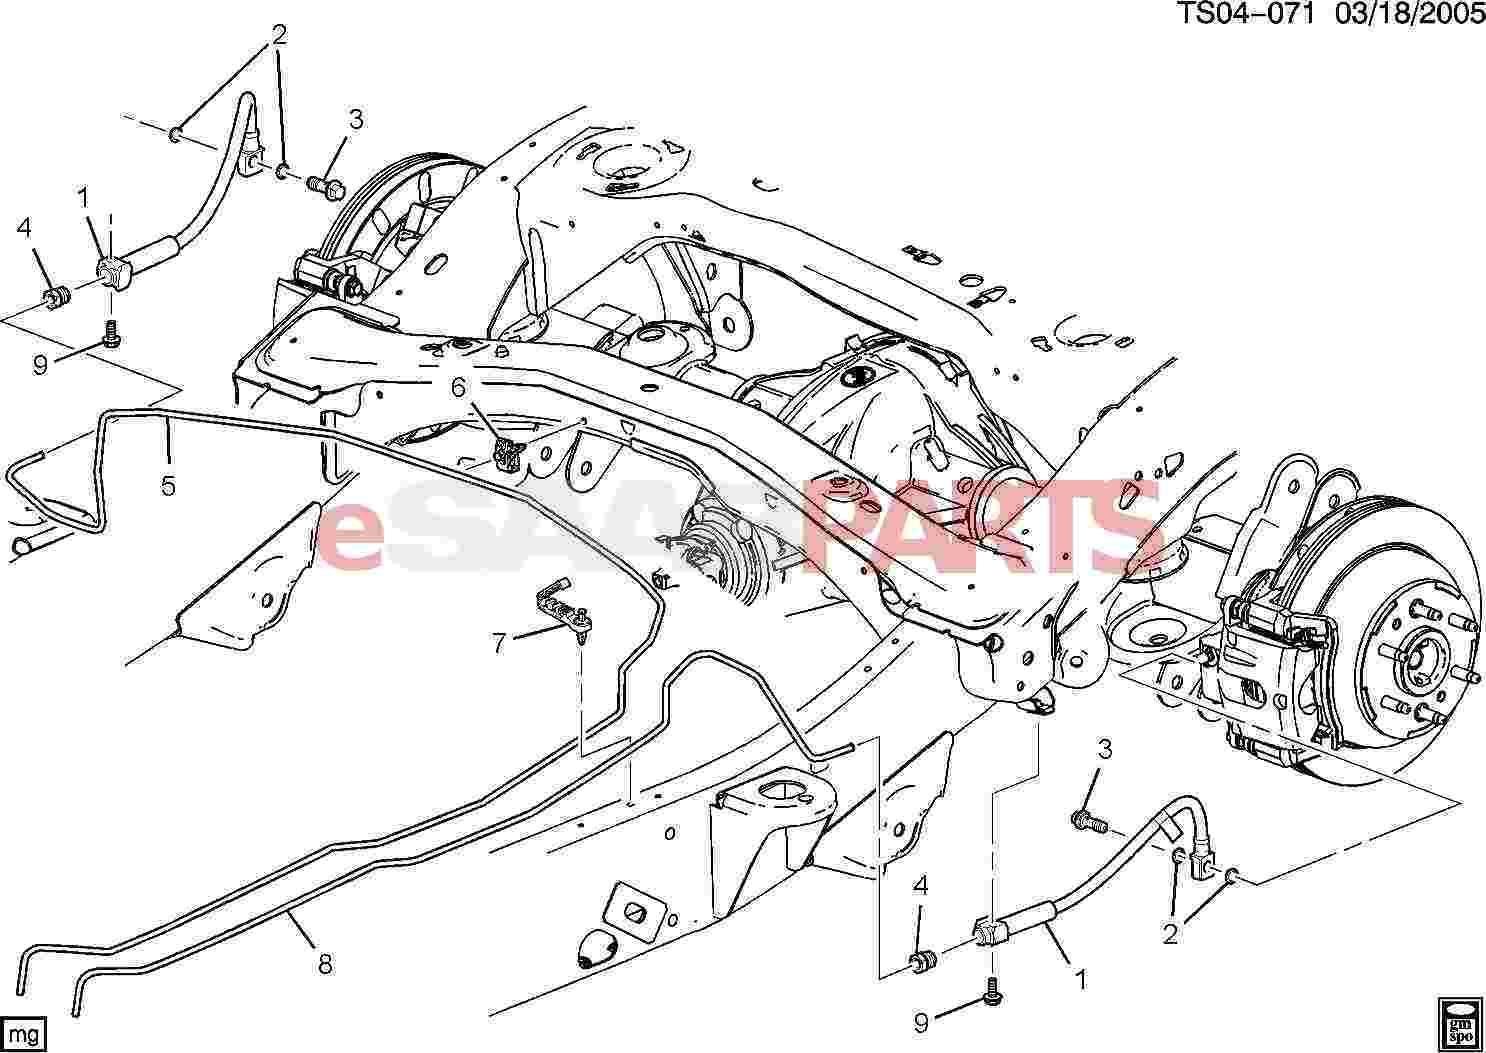 Saab Nut Rear Brk Pipe